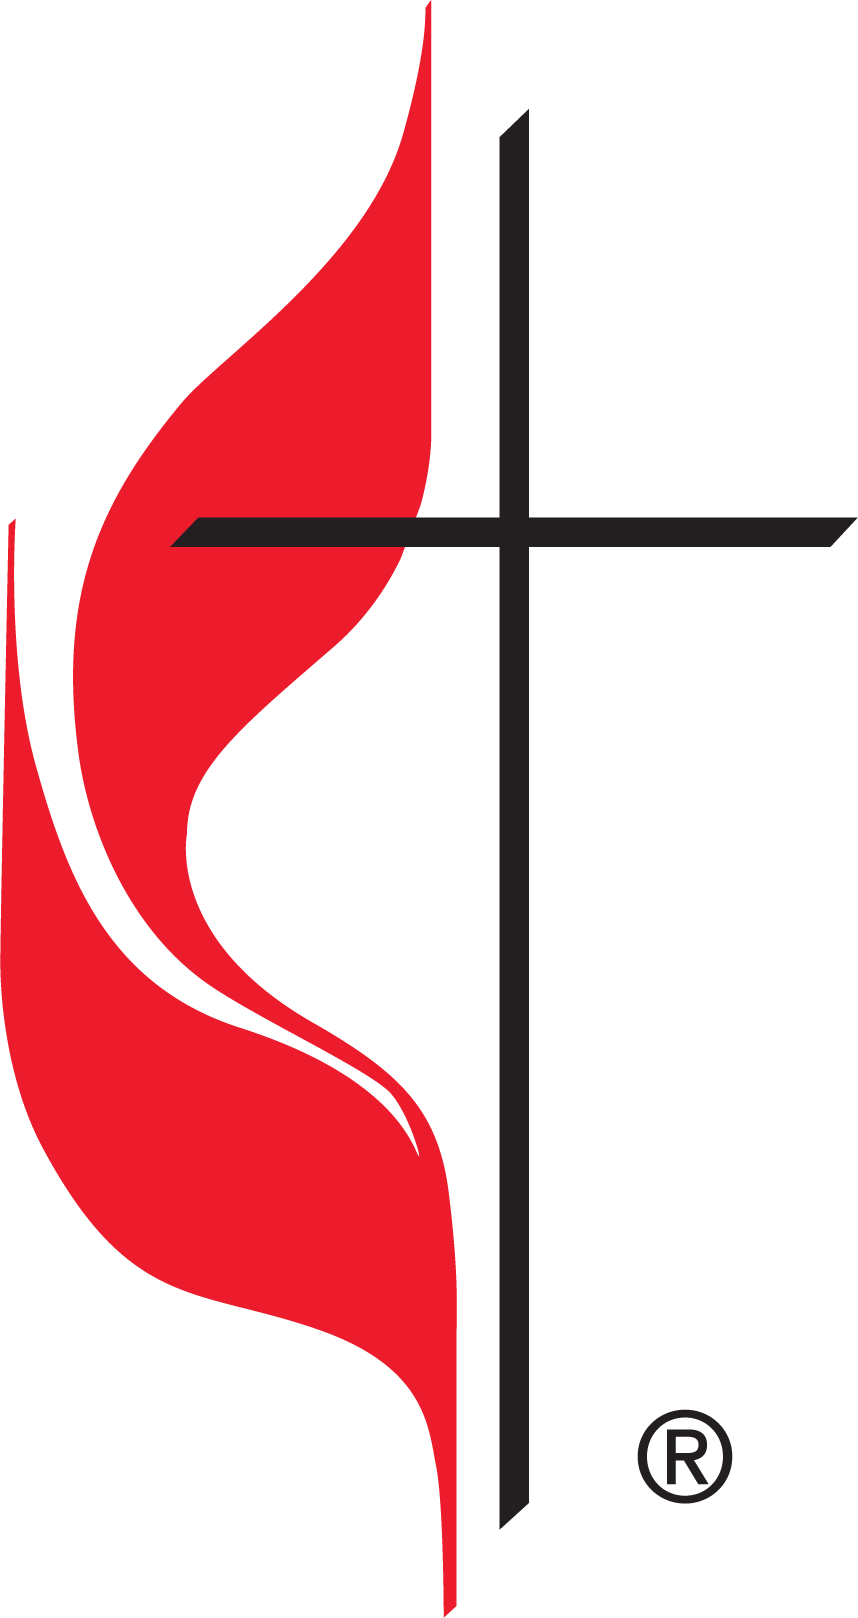 Logo resources at umc. Faith clipart action clipart